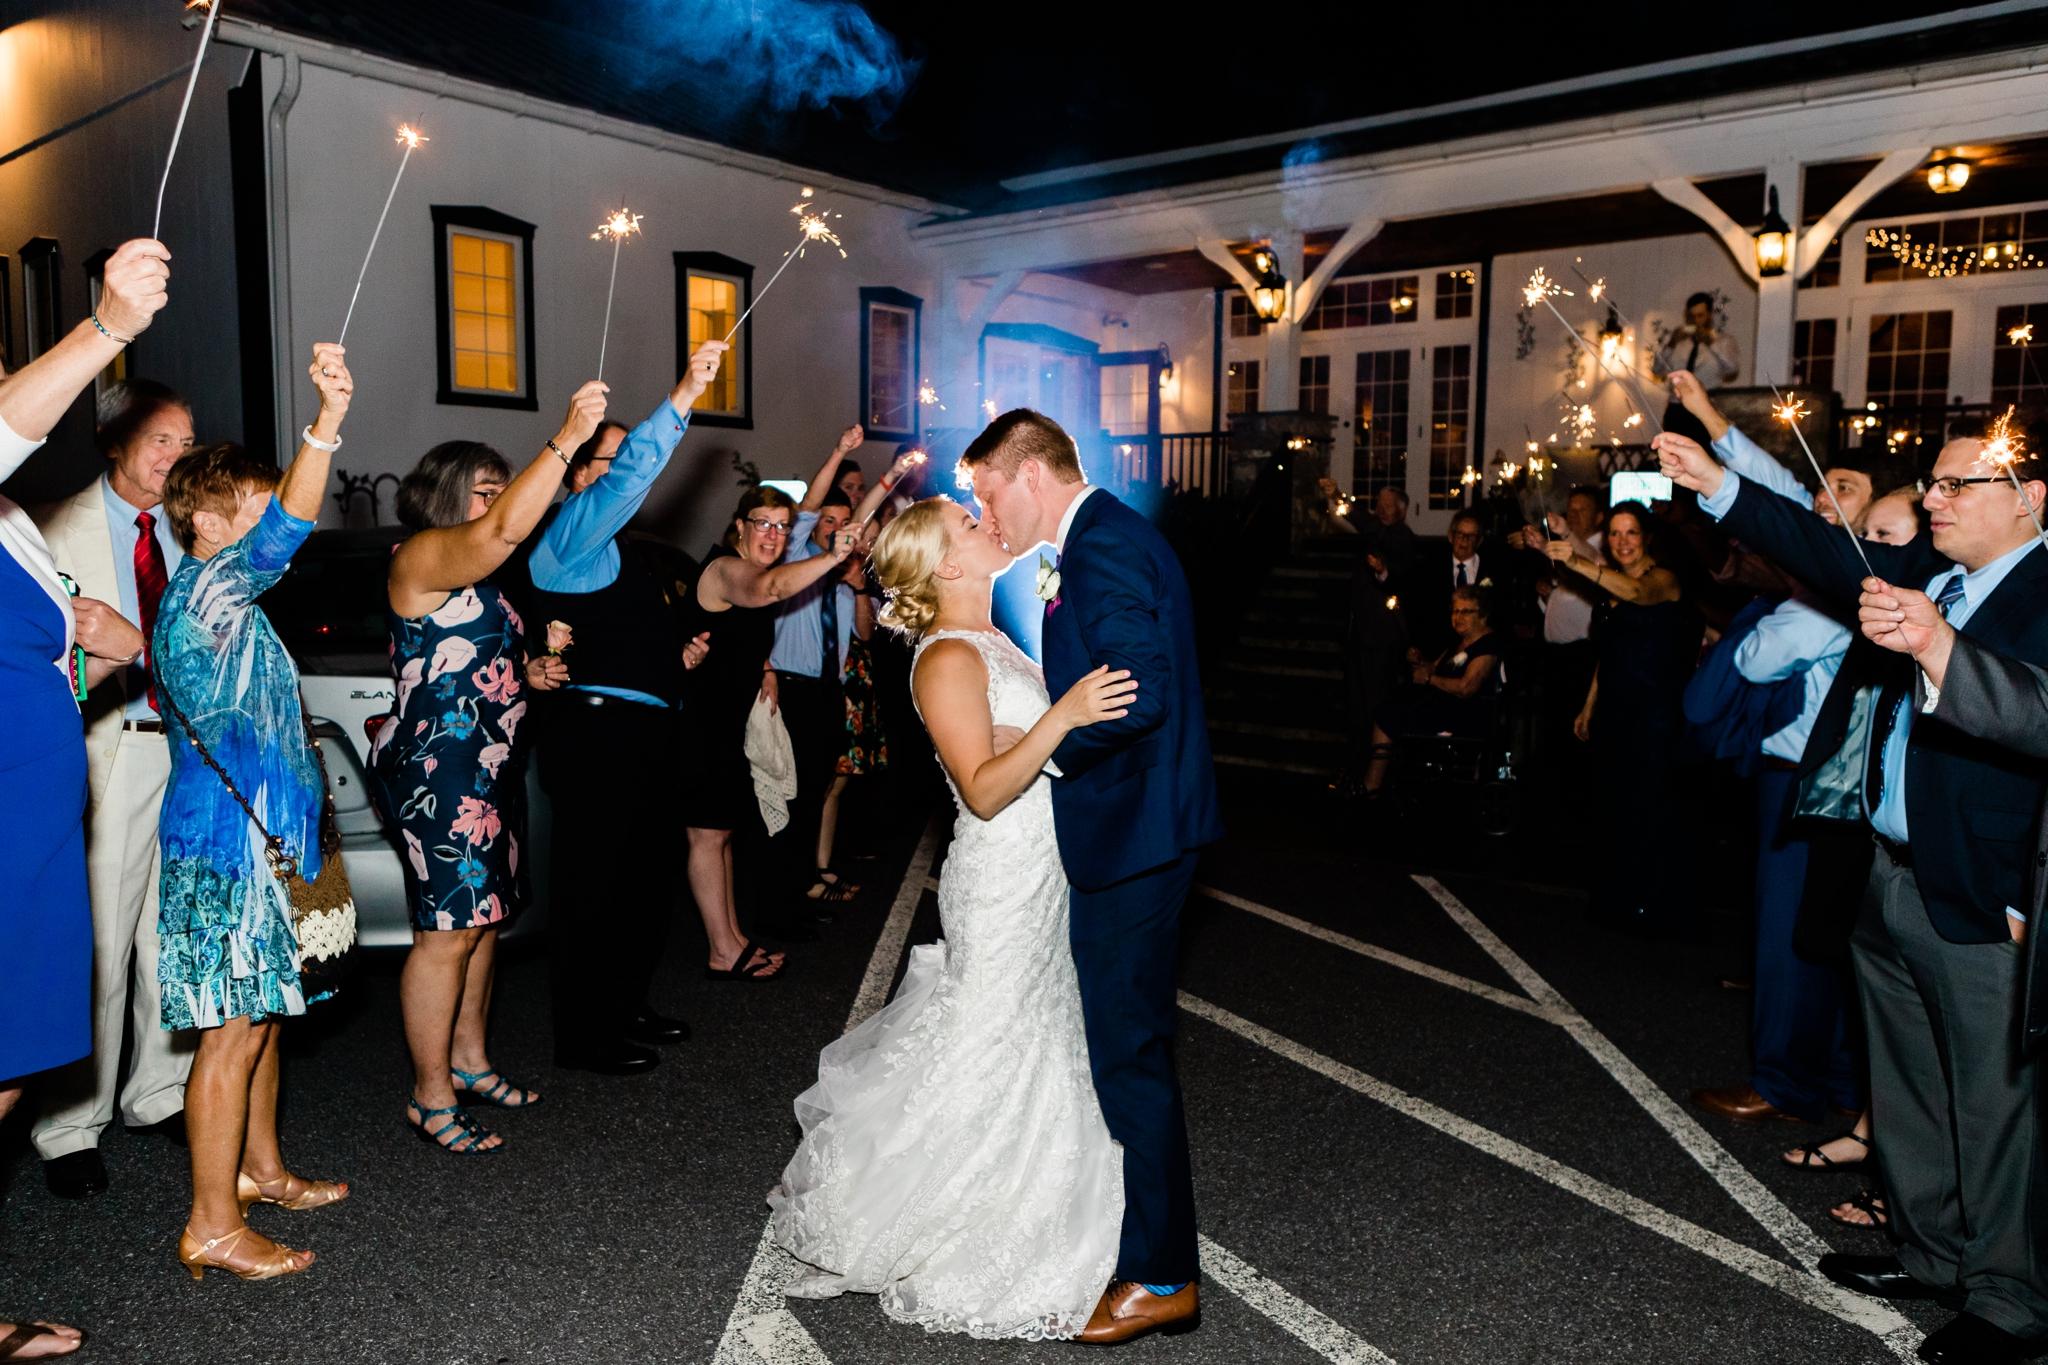 Emily Grace Photography, Lancaster PA Wedding Photographer, Wedding Photography for Unique Couples, The Barn at Silverstone, Lancaster PA Wedding Venue, The Barn at Silverstone Sparkler Exit